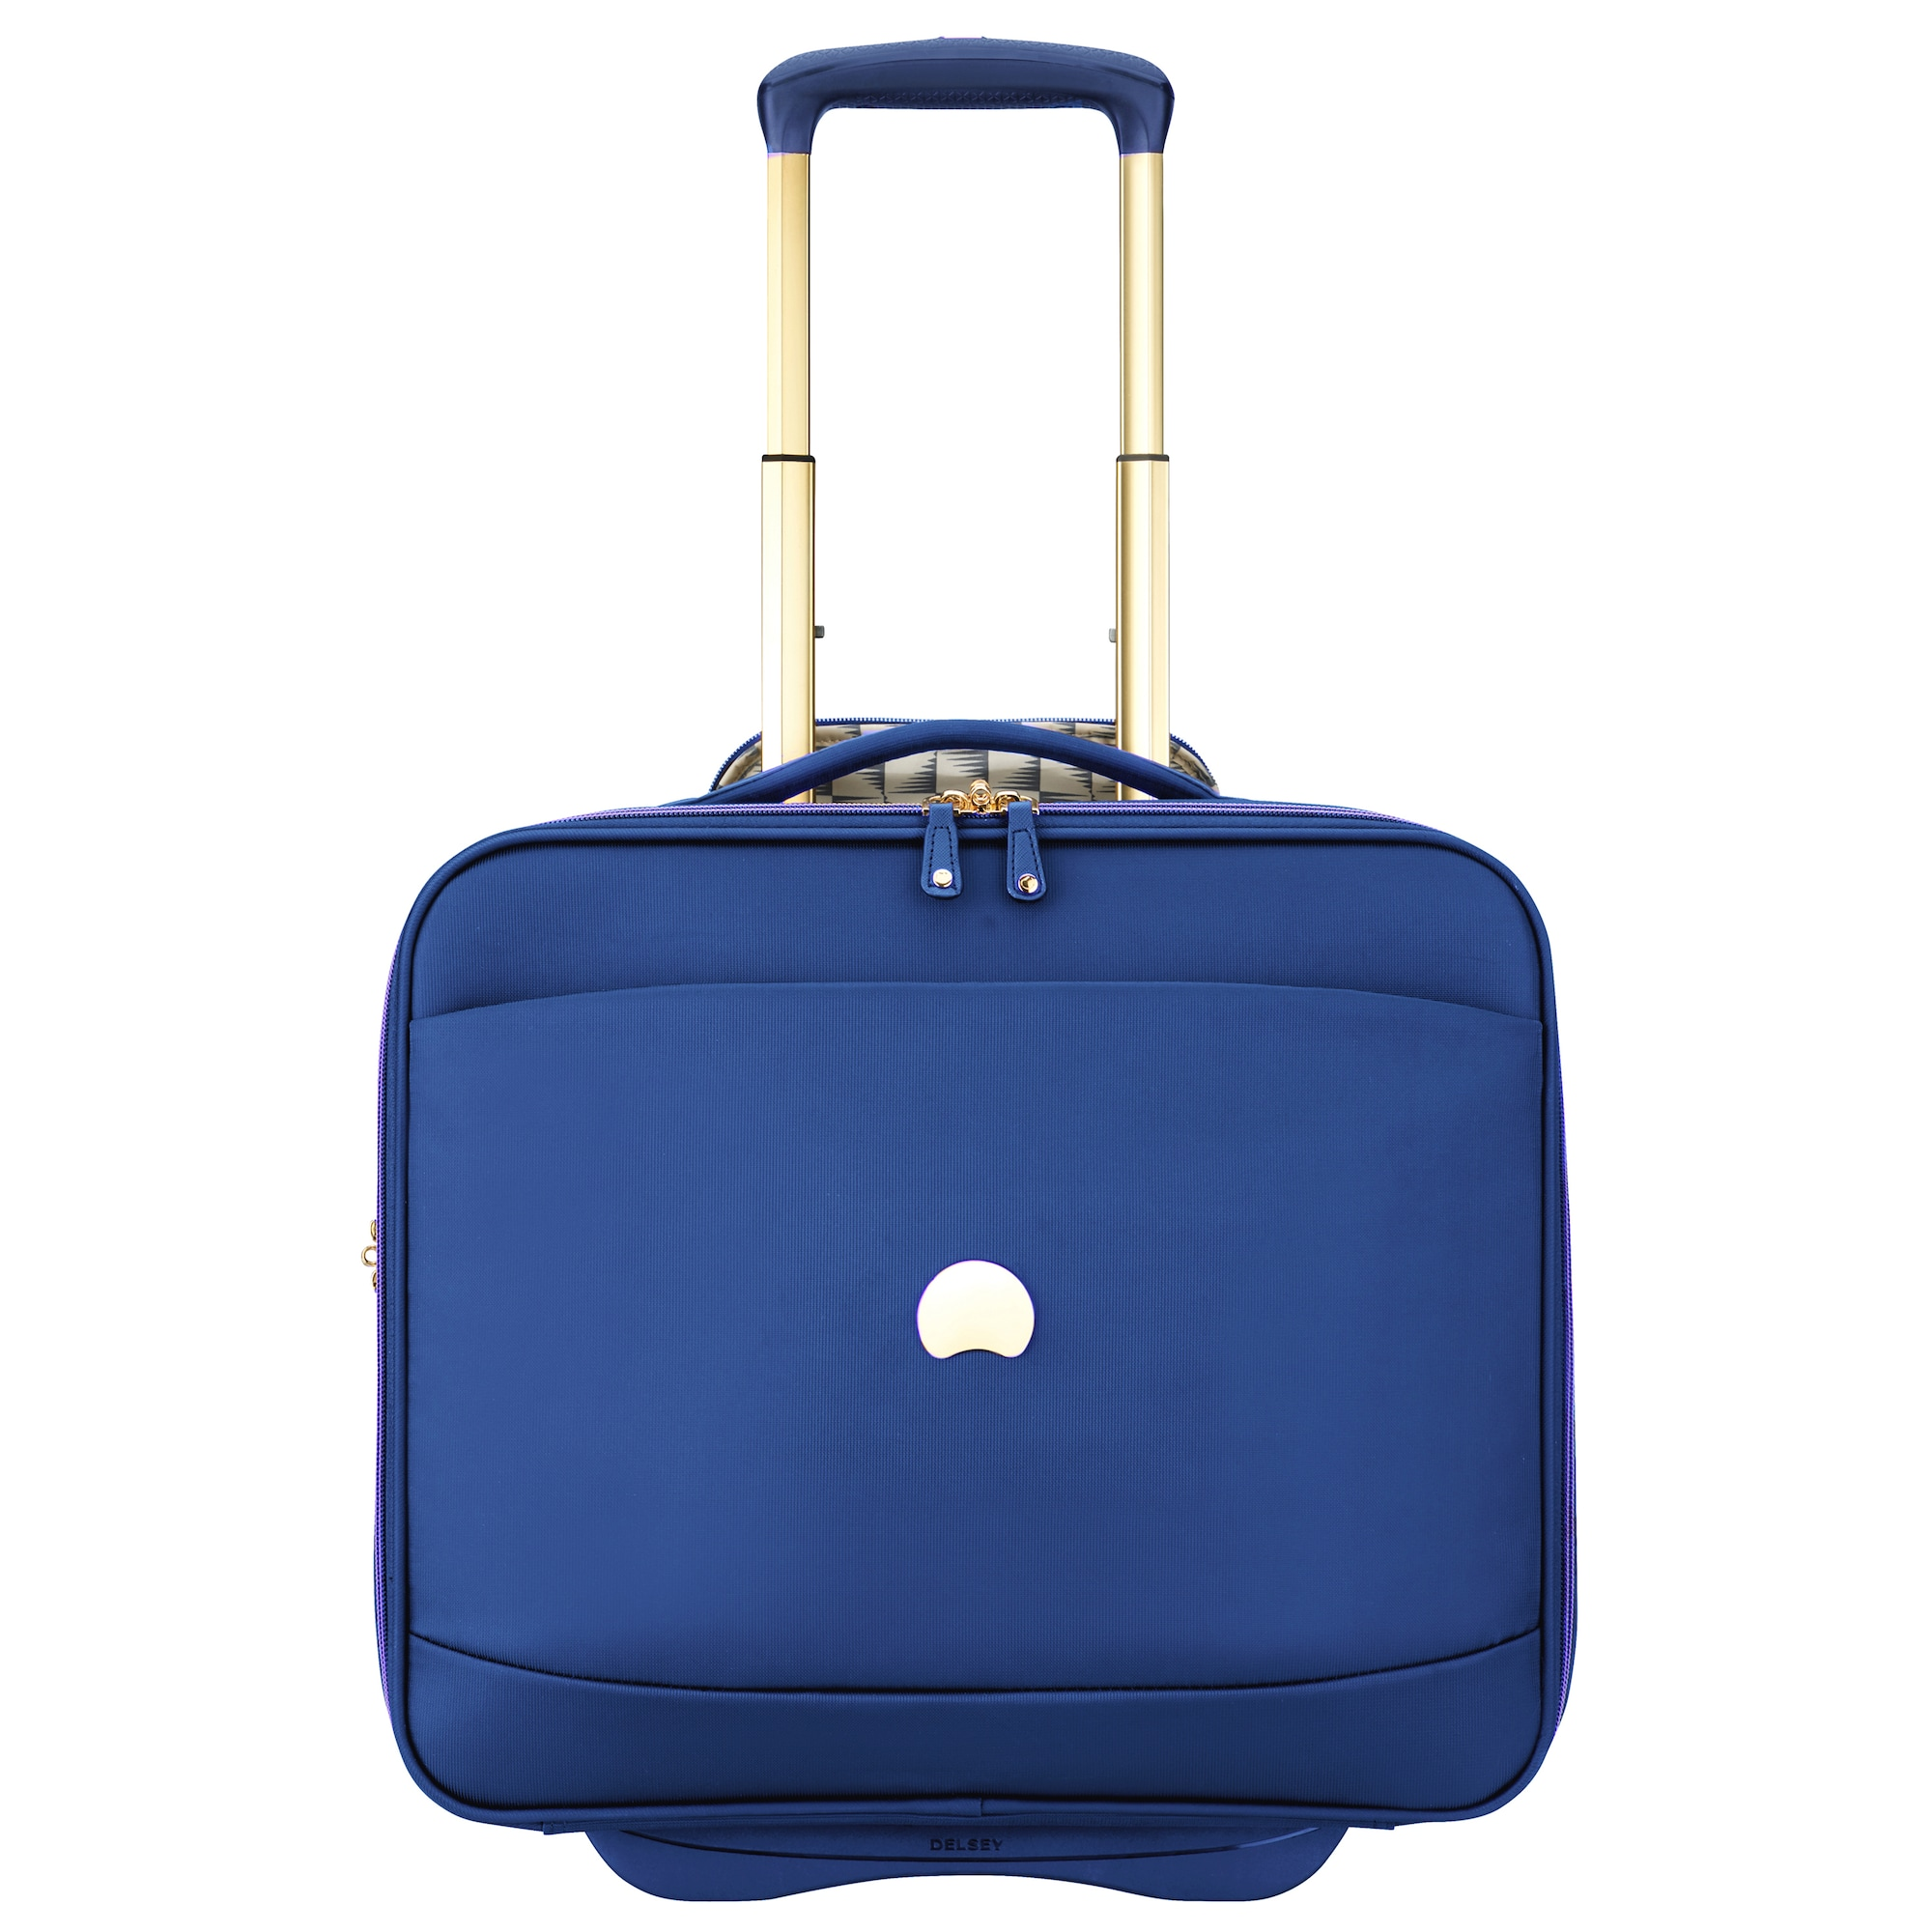 Businesstrolley   Taschen > Businesstaschen > Business Trolleys   Delsey